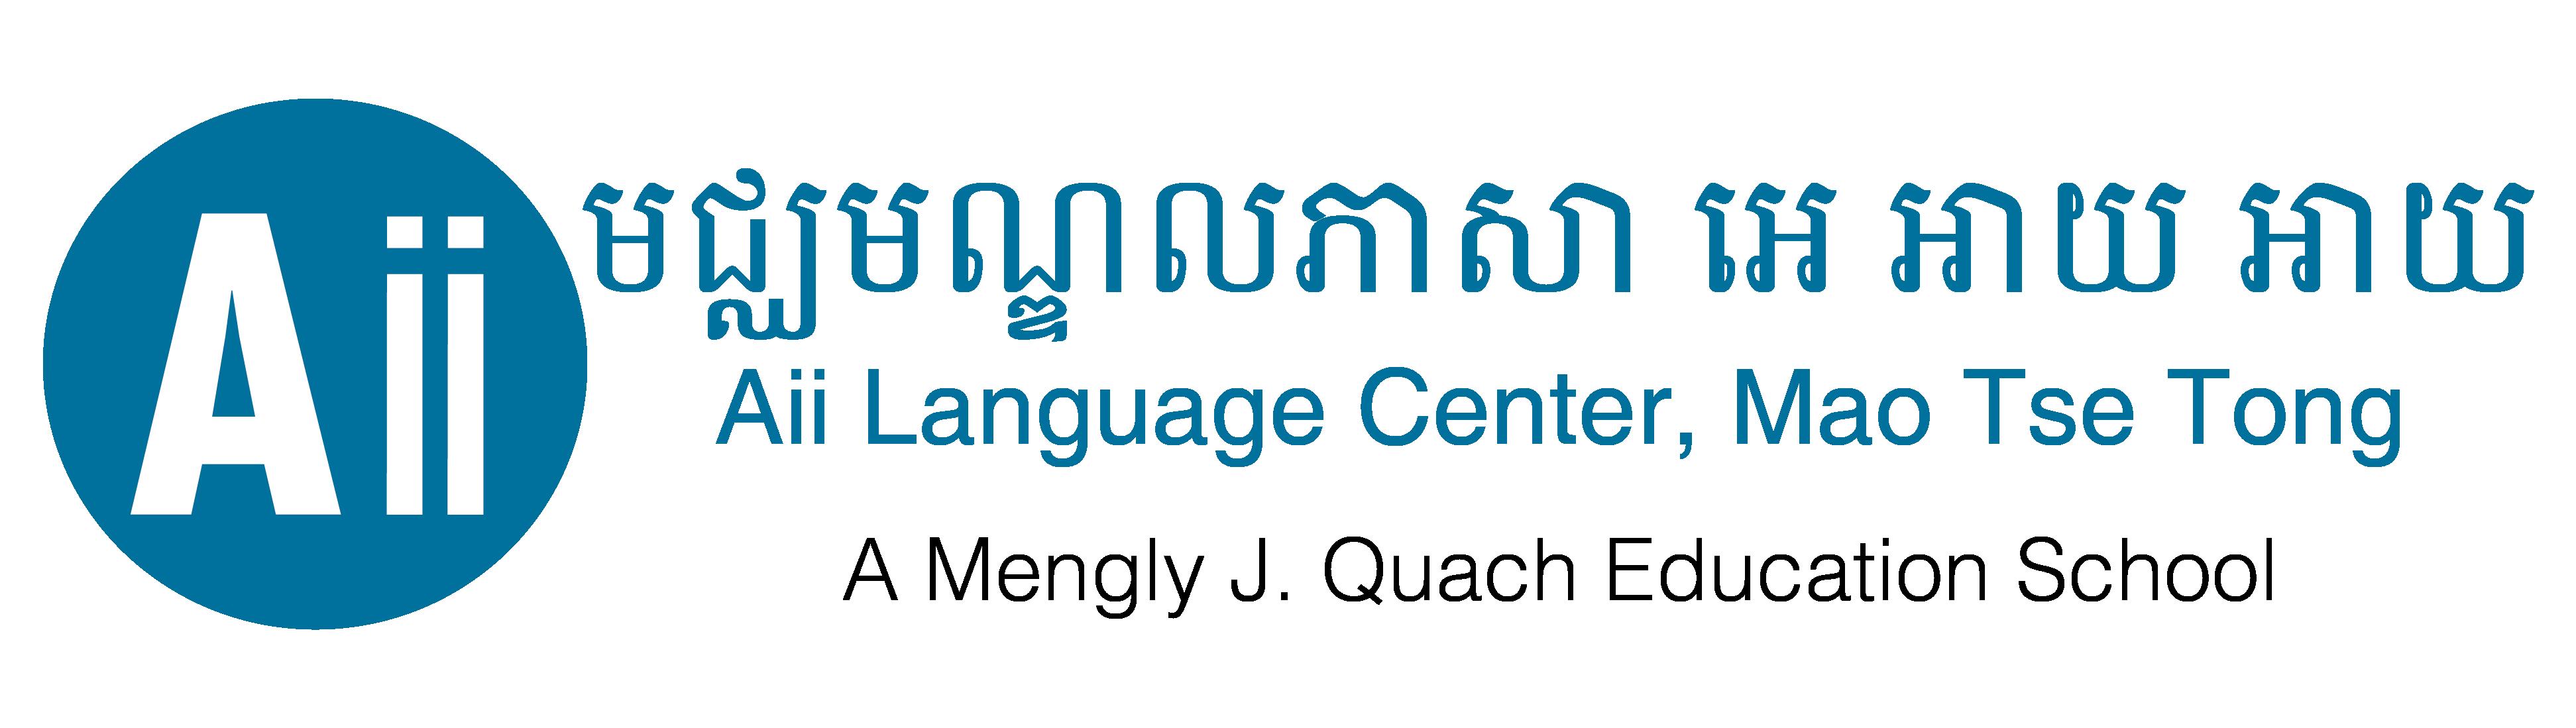 Aii Language Center | Mao Tse Tong Campus -